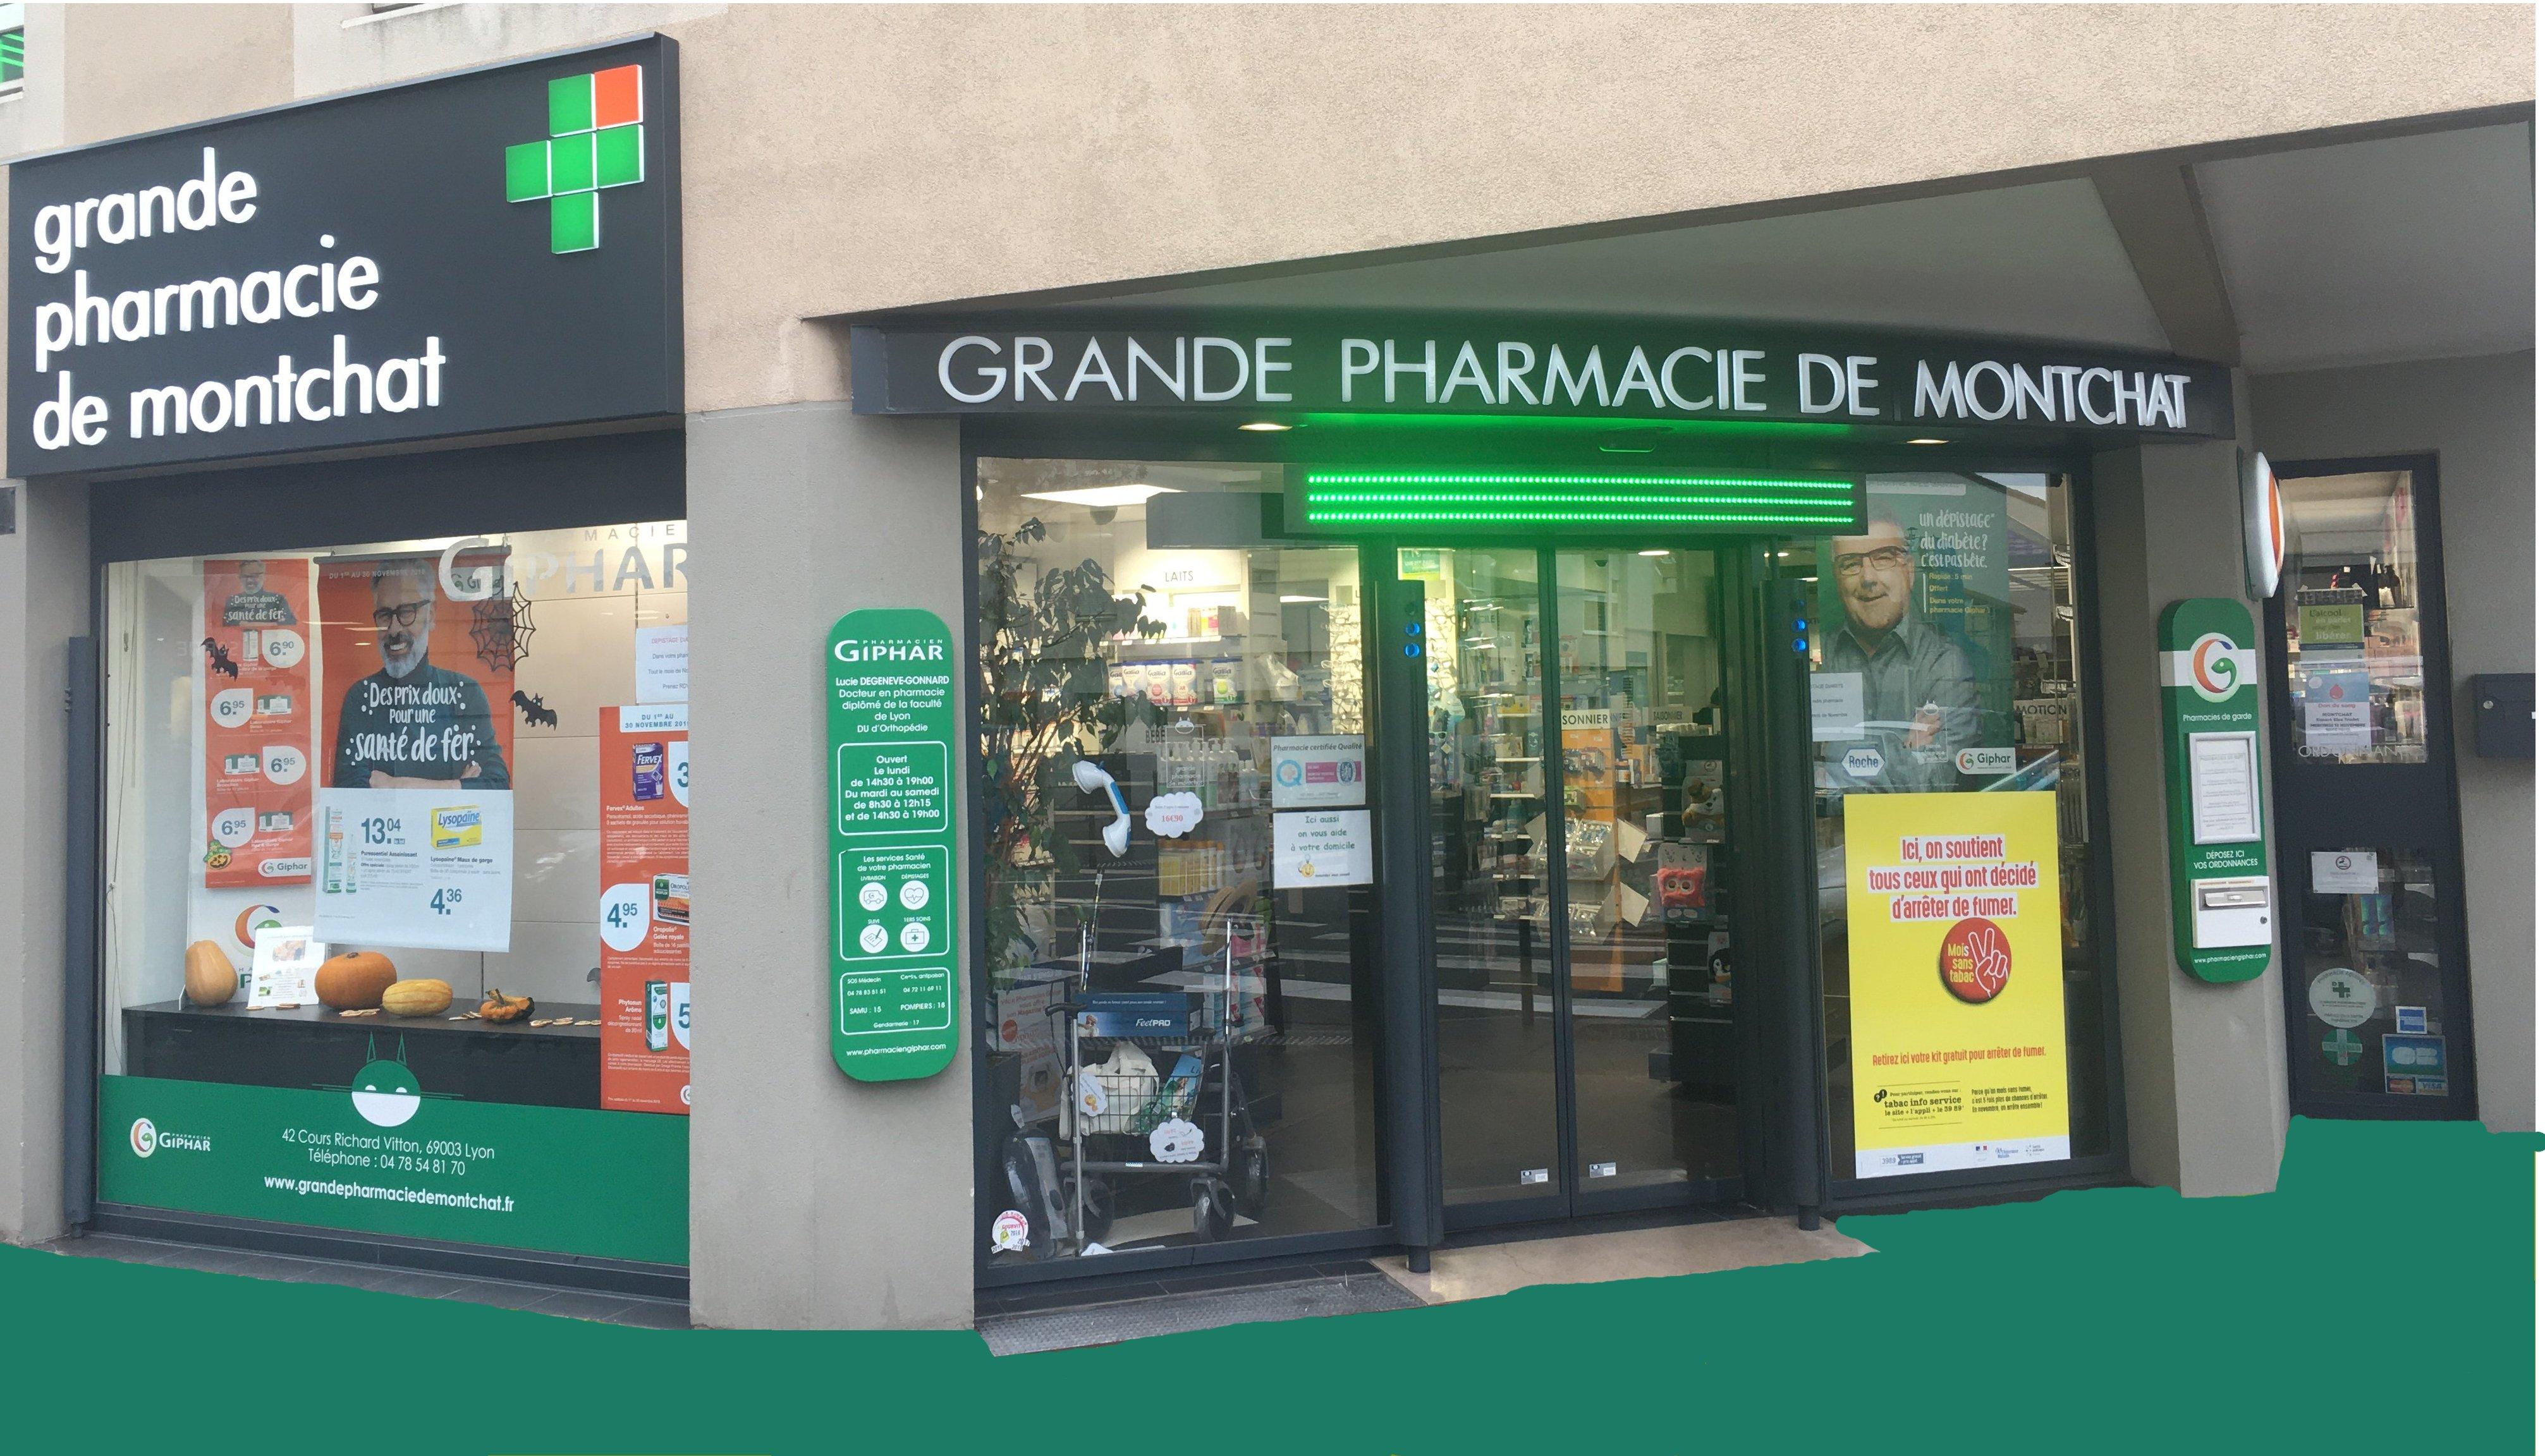 pharmacie avec borne carte vitale Carte vitale – Grande Pharmacie De Montchat